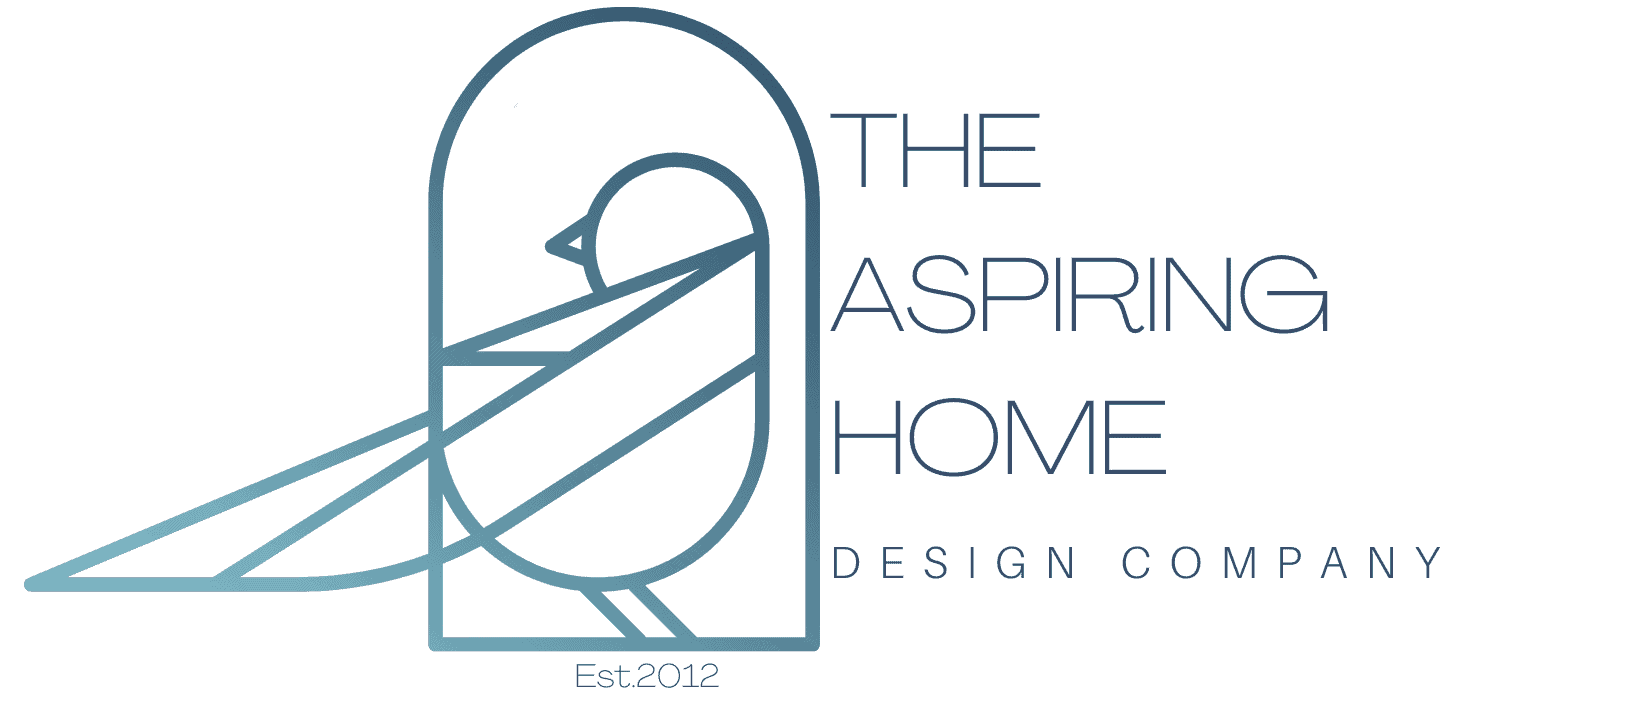 The Aspiring Home